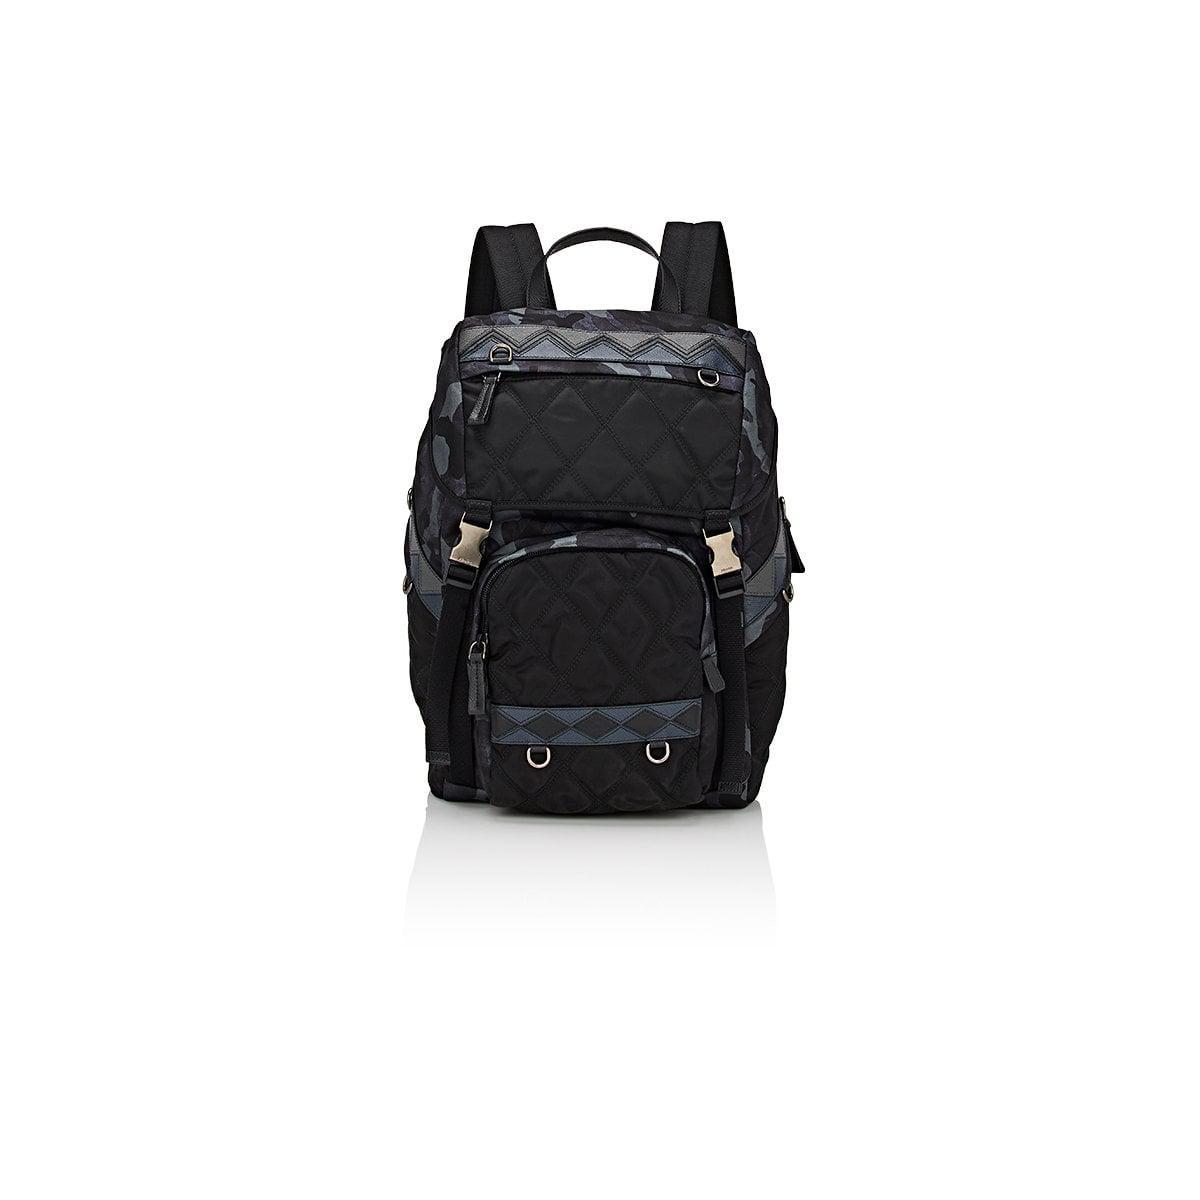 04f90ed5d64d greece prada. mens blue navy mountain fabric backpack c28f7 6fdb0; italy  lyst prada camouflage backpack in blue for men 1b9d5 5da61